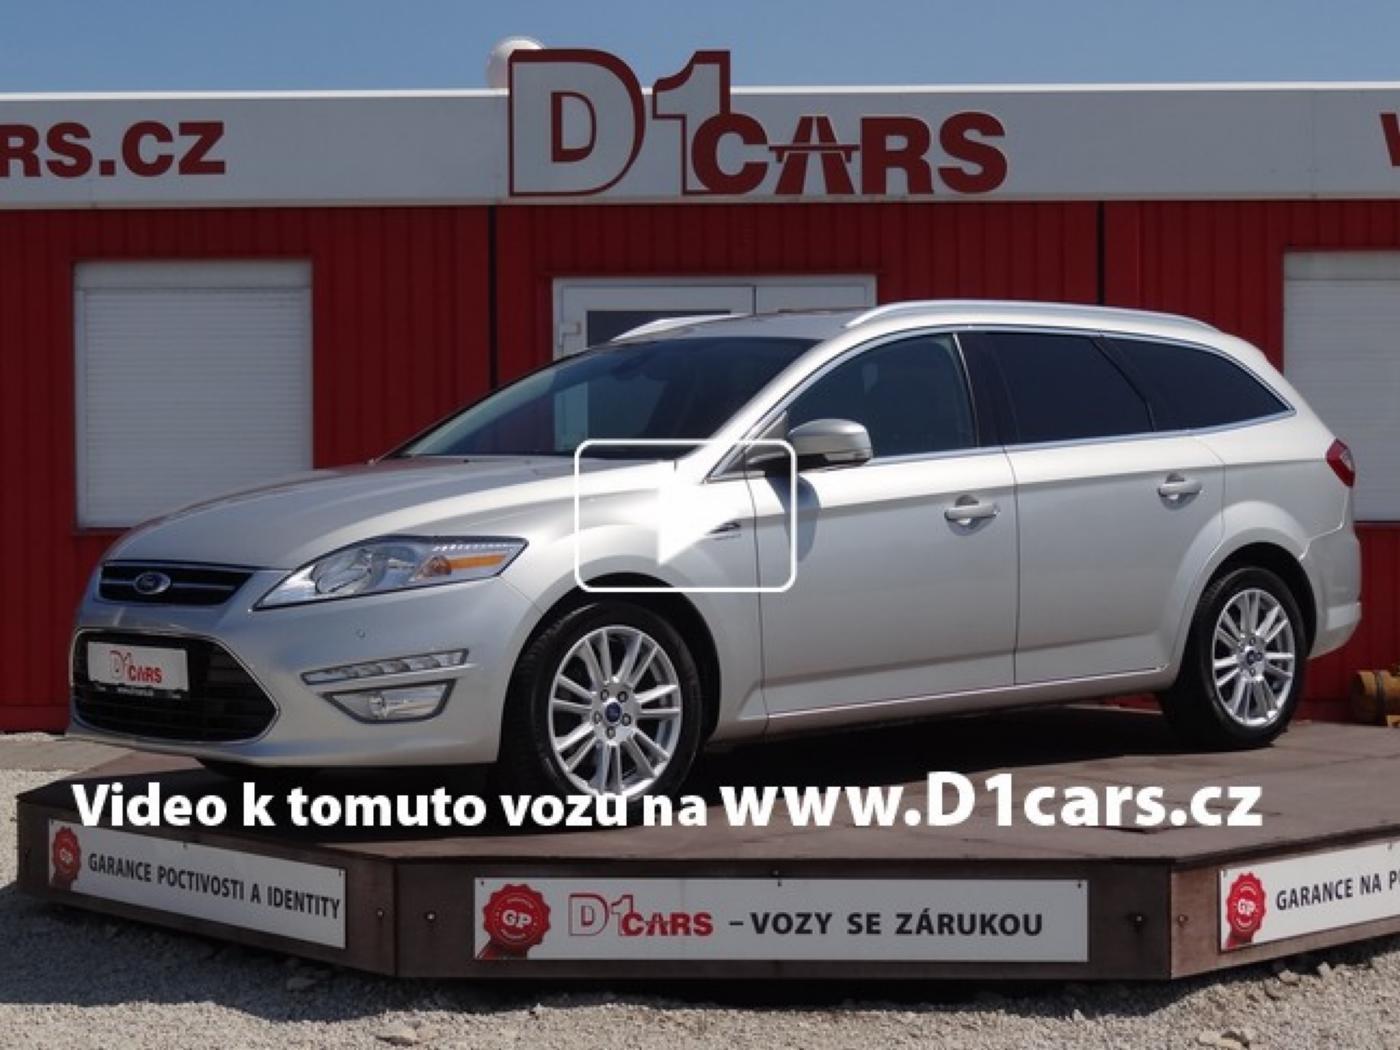 Ford Mondeo 2.0 TDCi Titanium NAVI, ZIMNÍ PAKET, nabídka A81/17